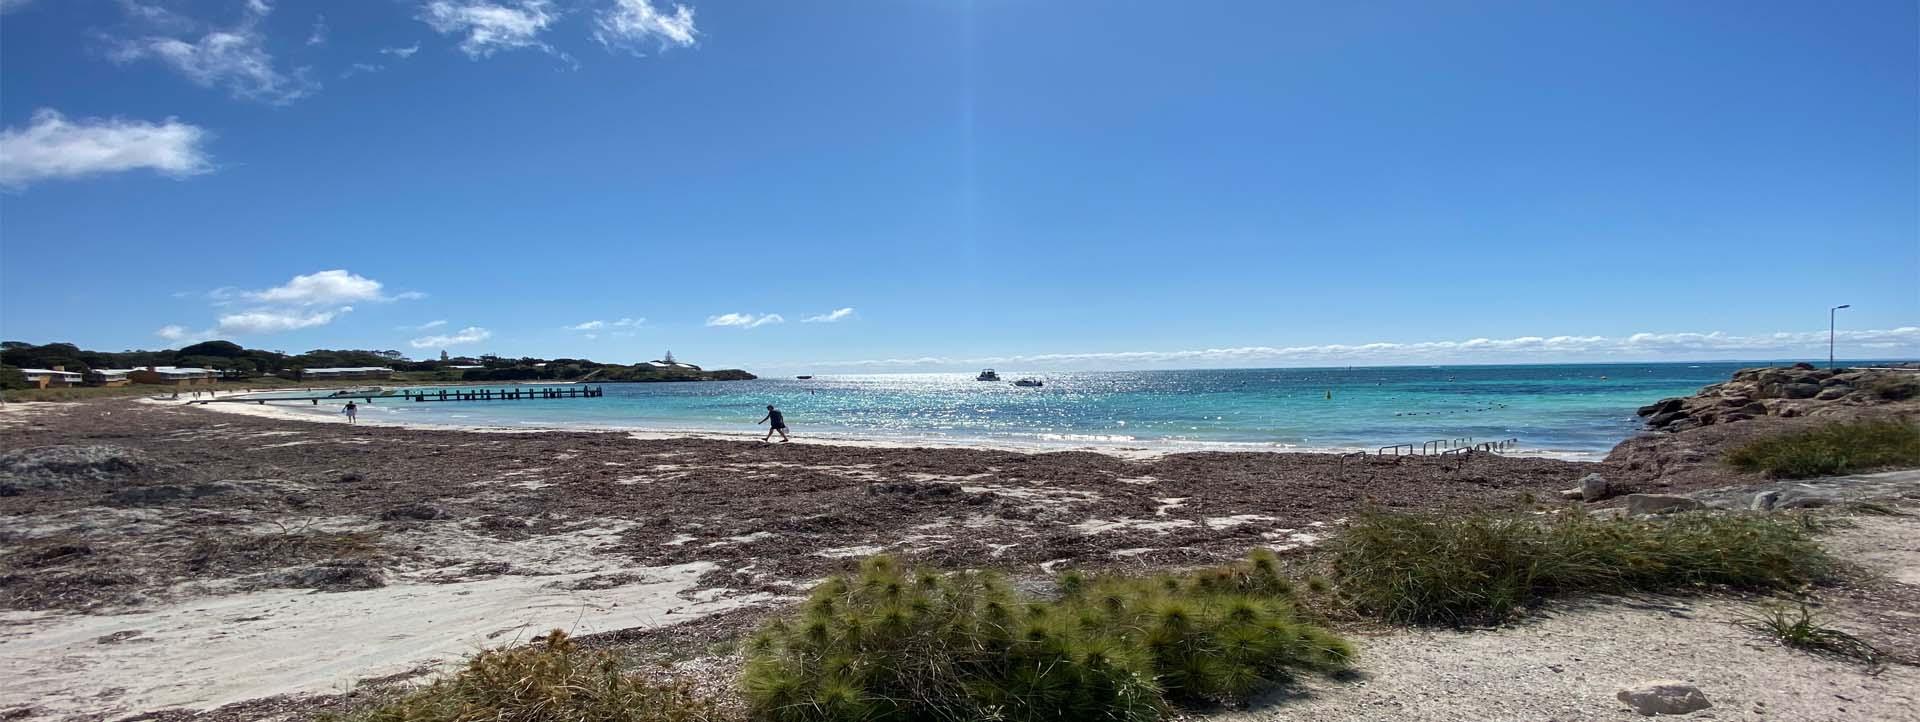 ROTTNEST ISLAND CHARTERS JADEN slider